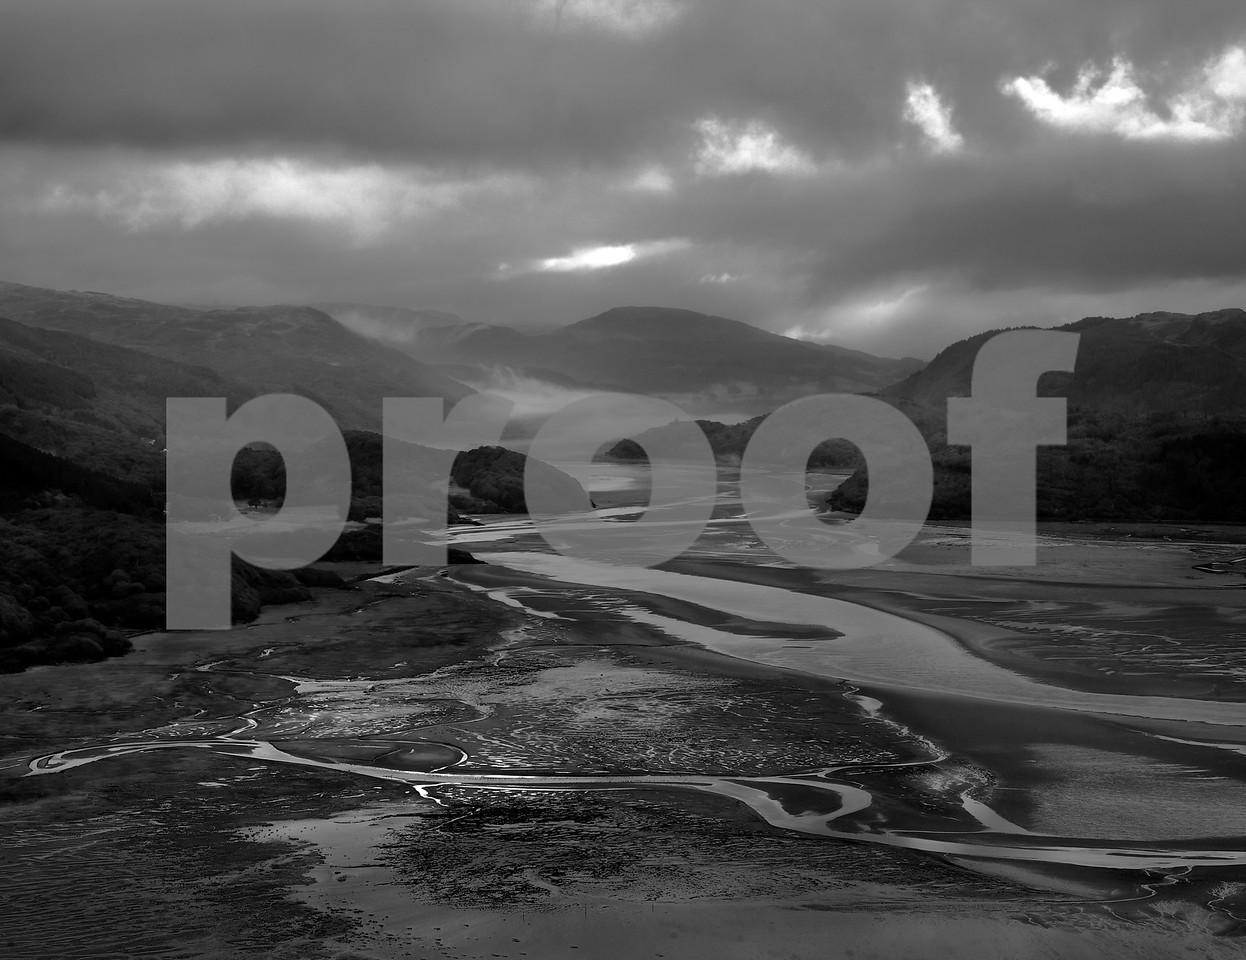 Mawddach Estuary in Snowdonia Wales ad first light